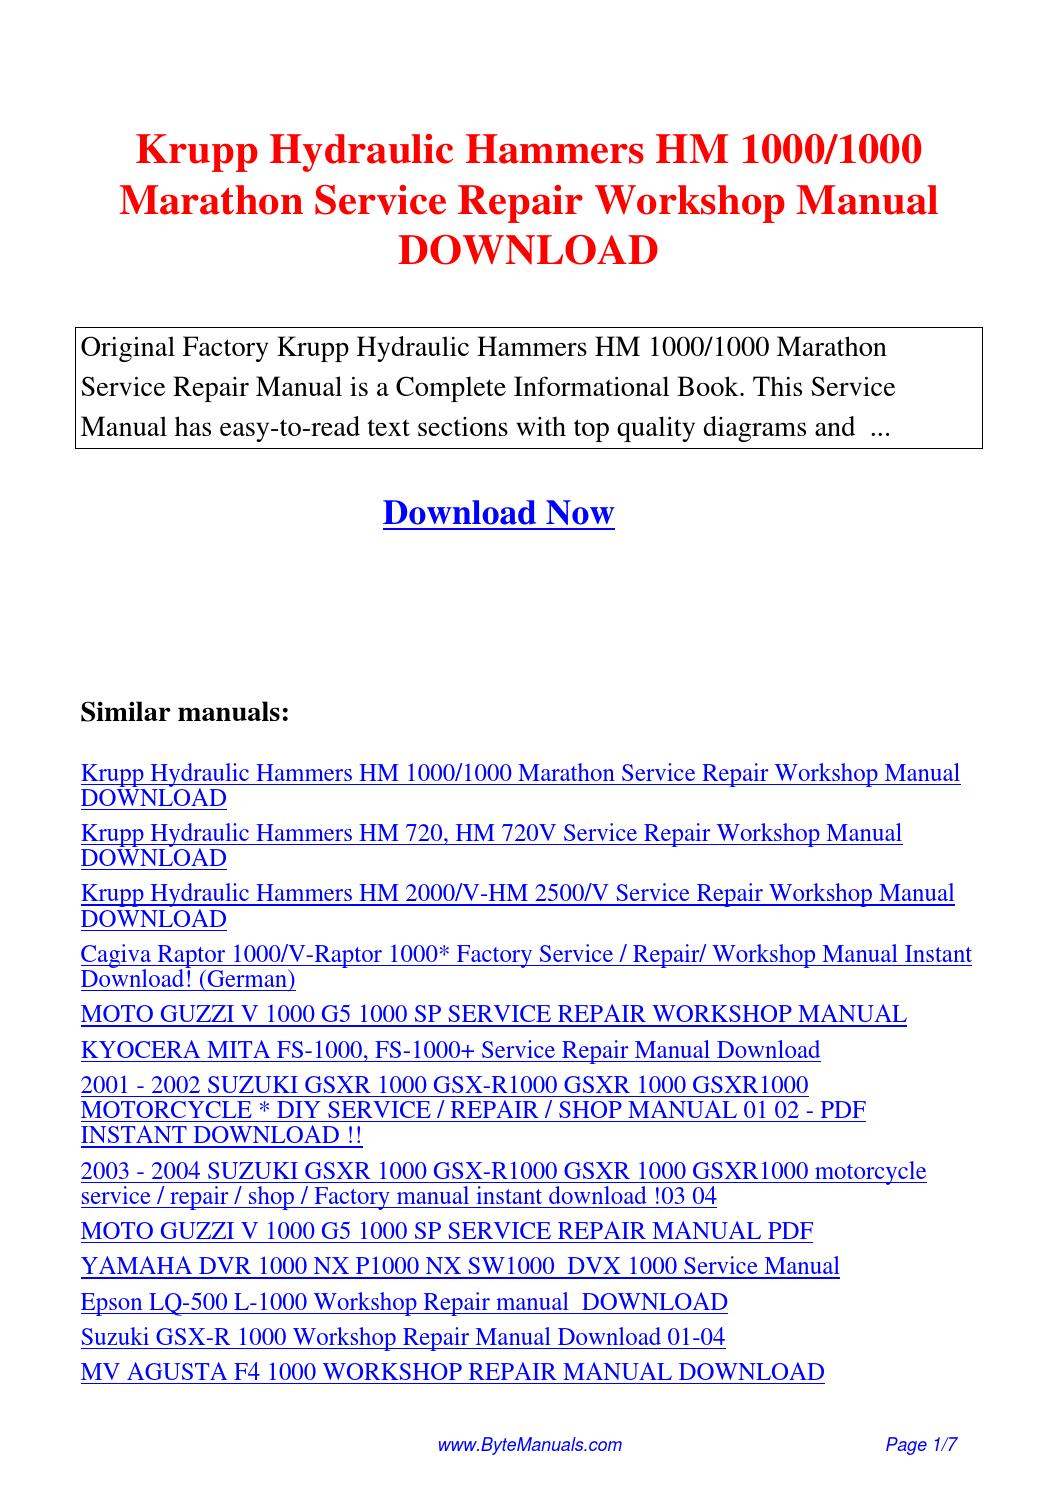 Krupp Hydraulic Hammers HM 1000 1000 Marathon Service Repair Workshop Manual.pdf  by Ging Tang - issuu